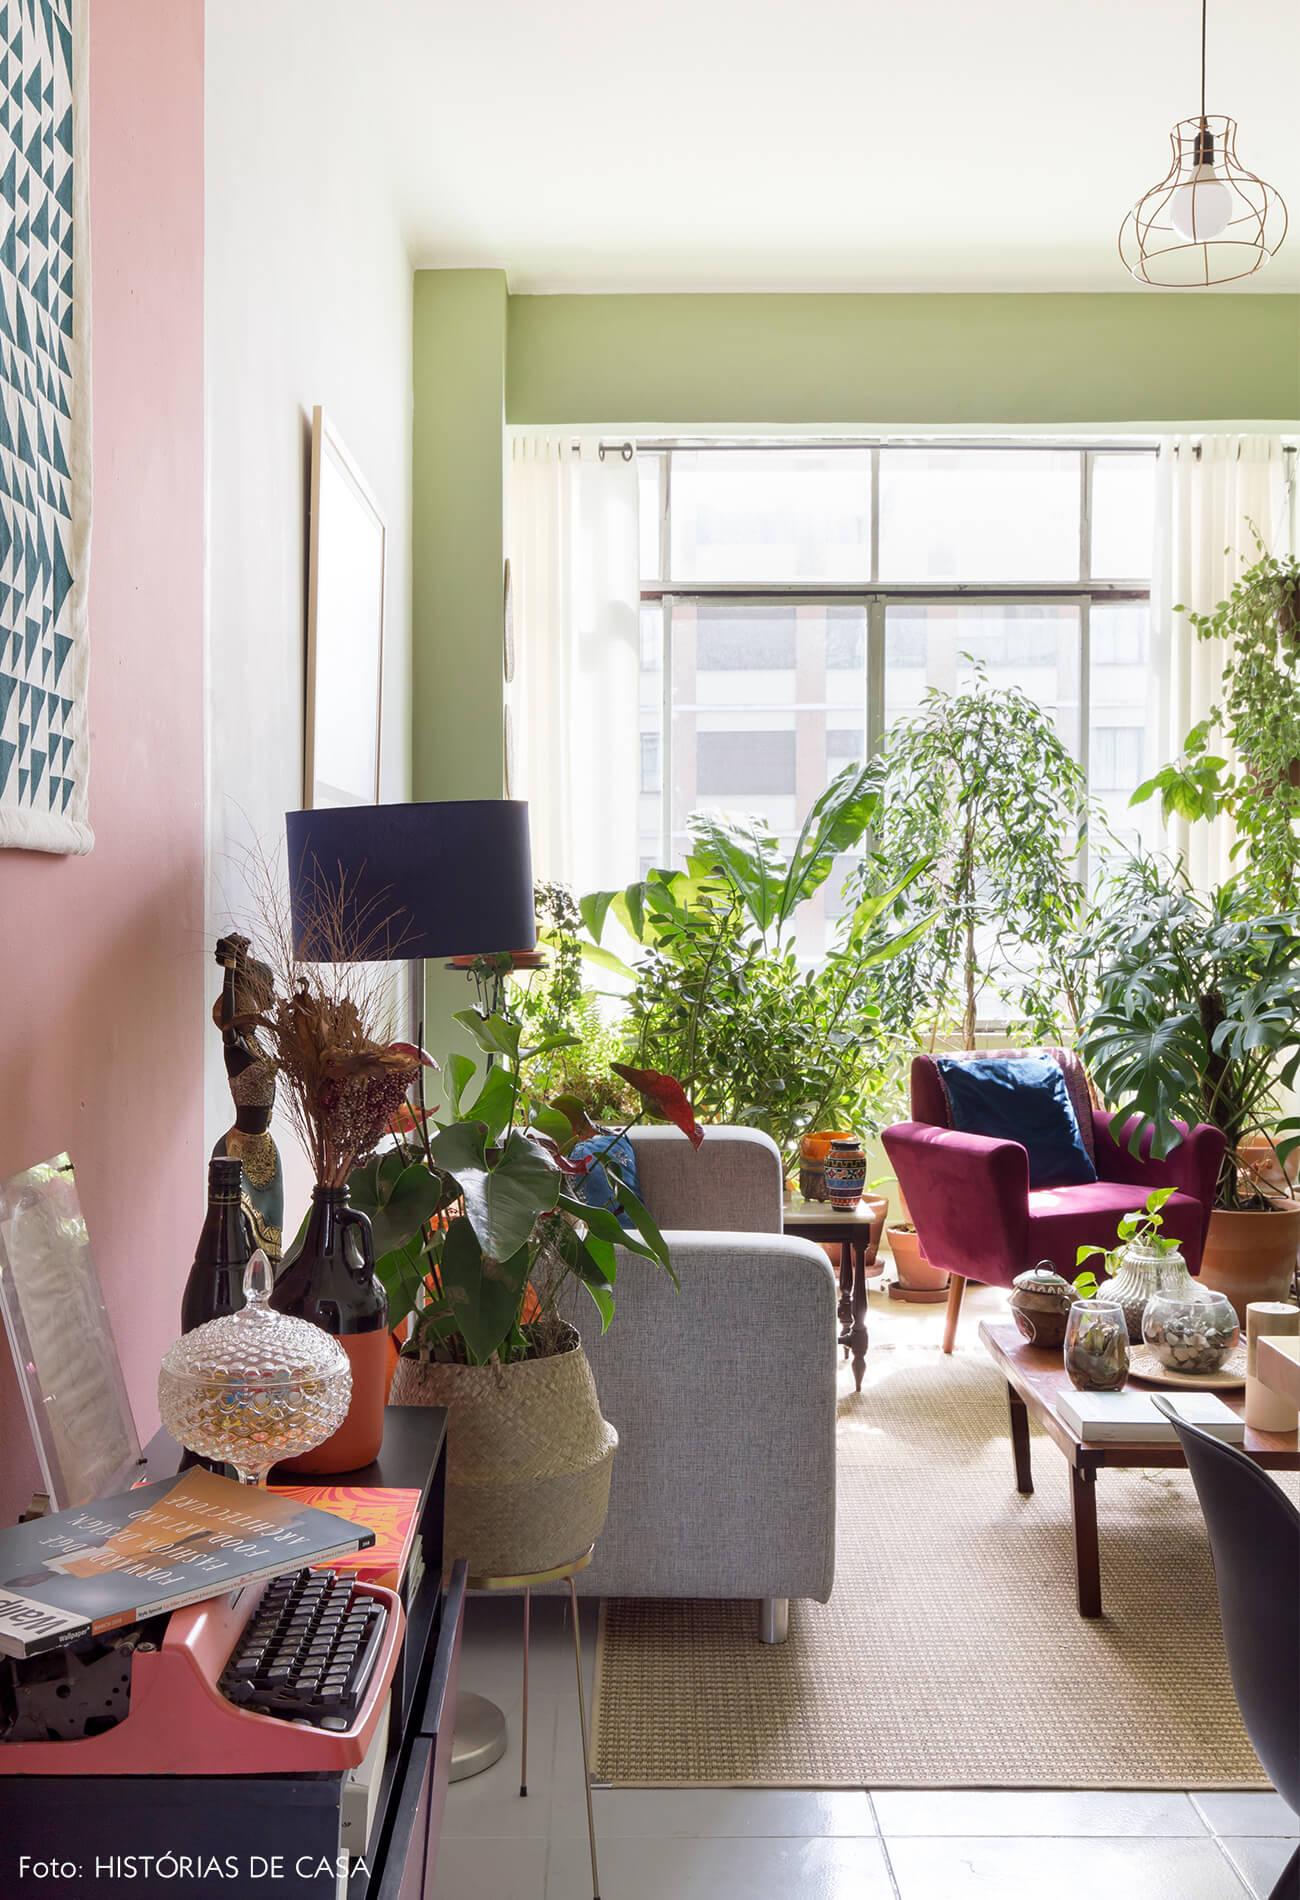 parede-rosa-e-verde-poltrona-rosa-almofada-azul-plantas-tapete-palha